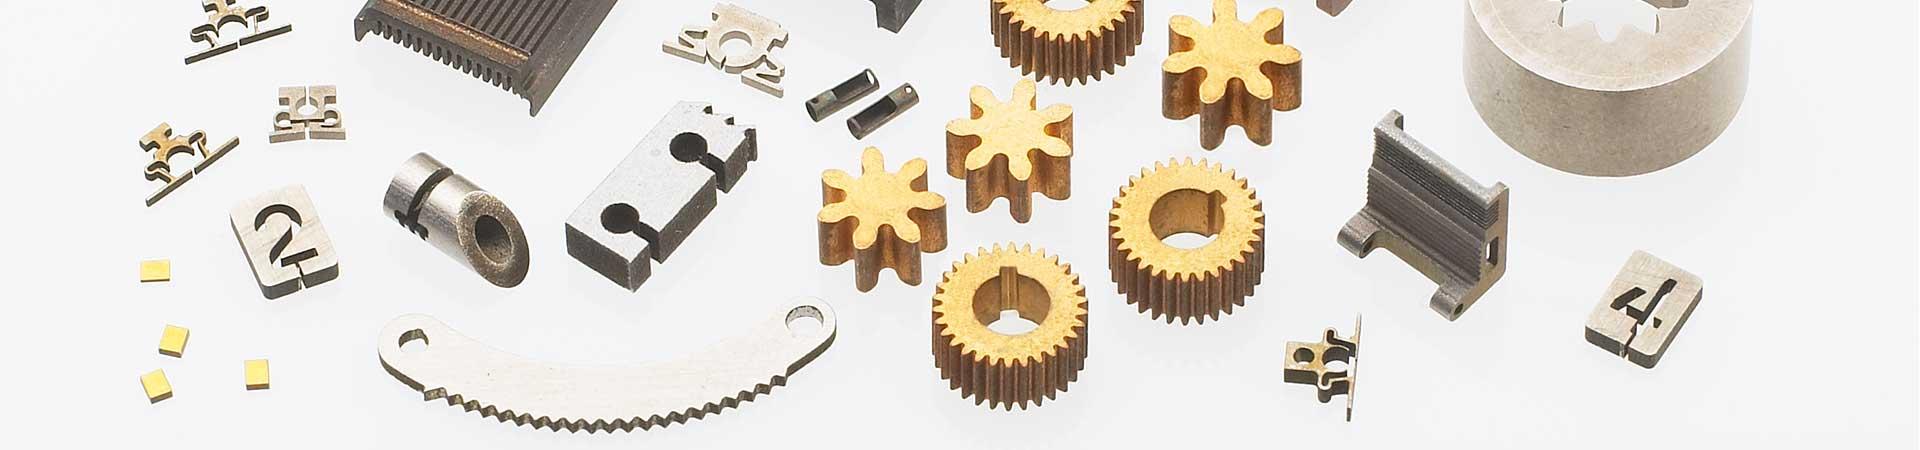 small CNC machine metal parts